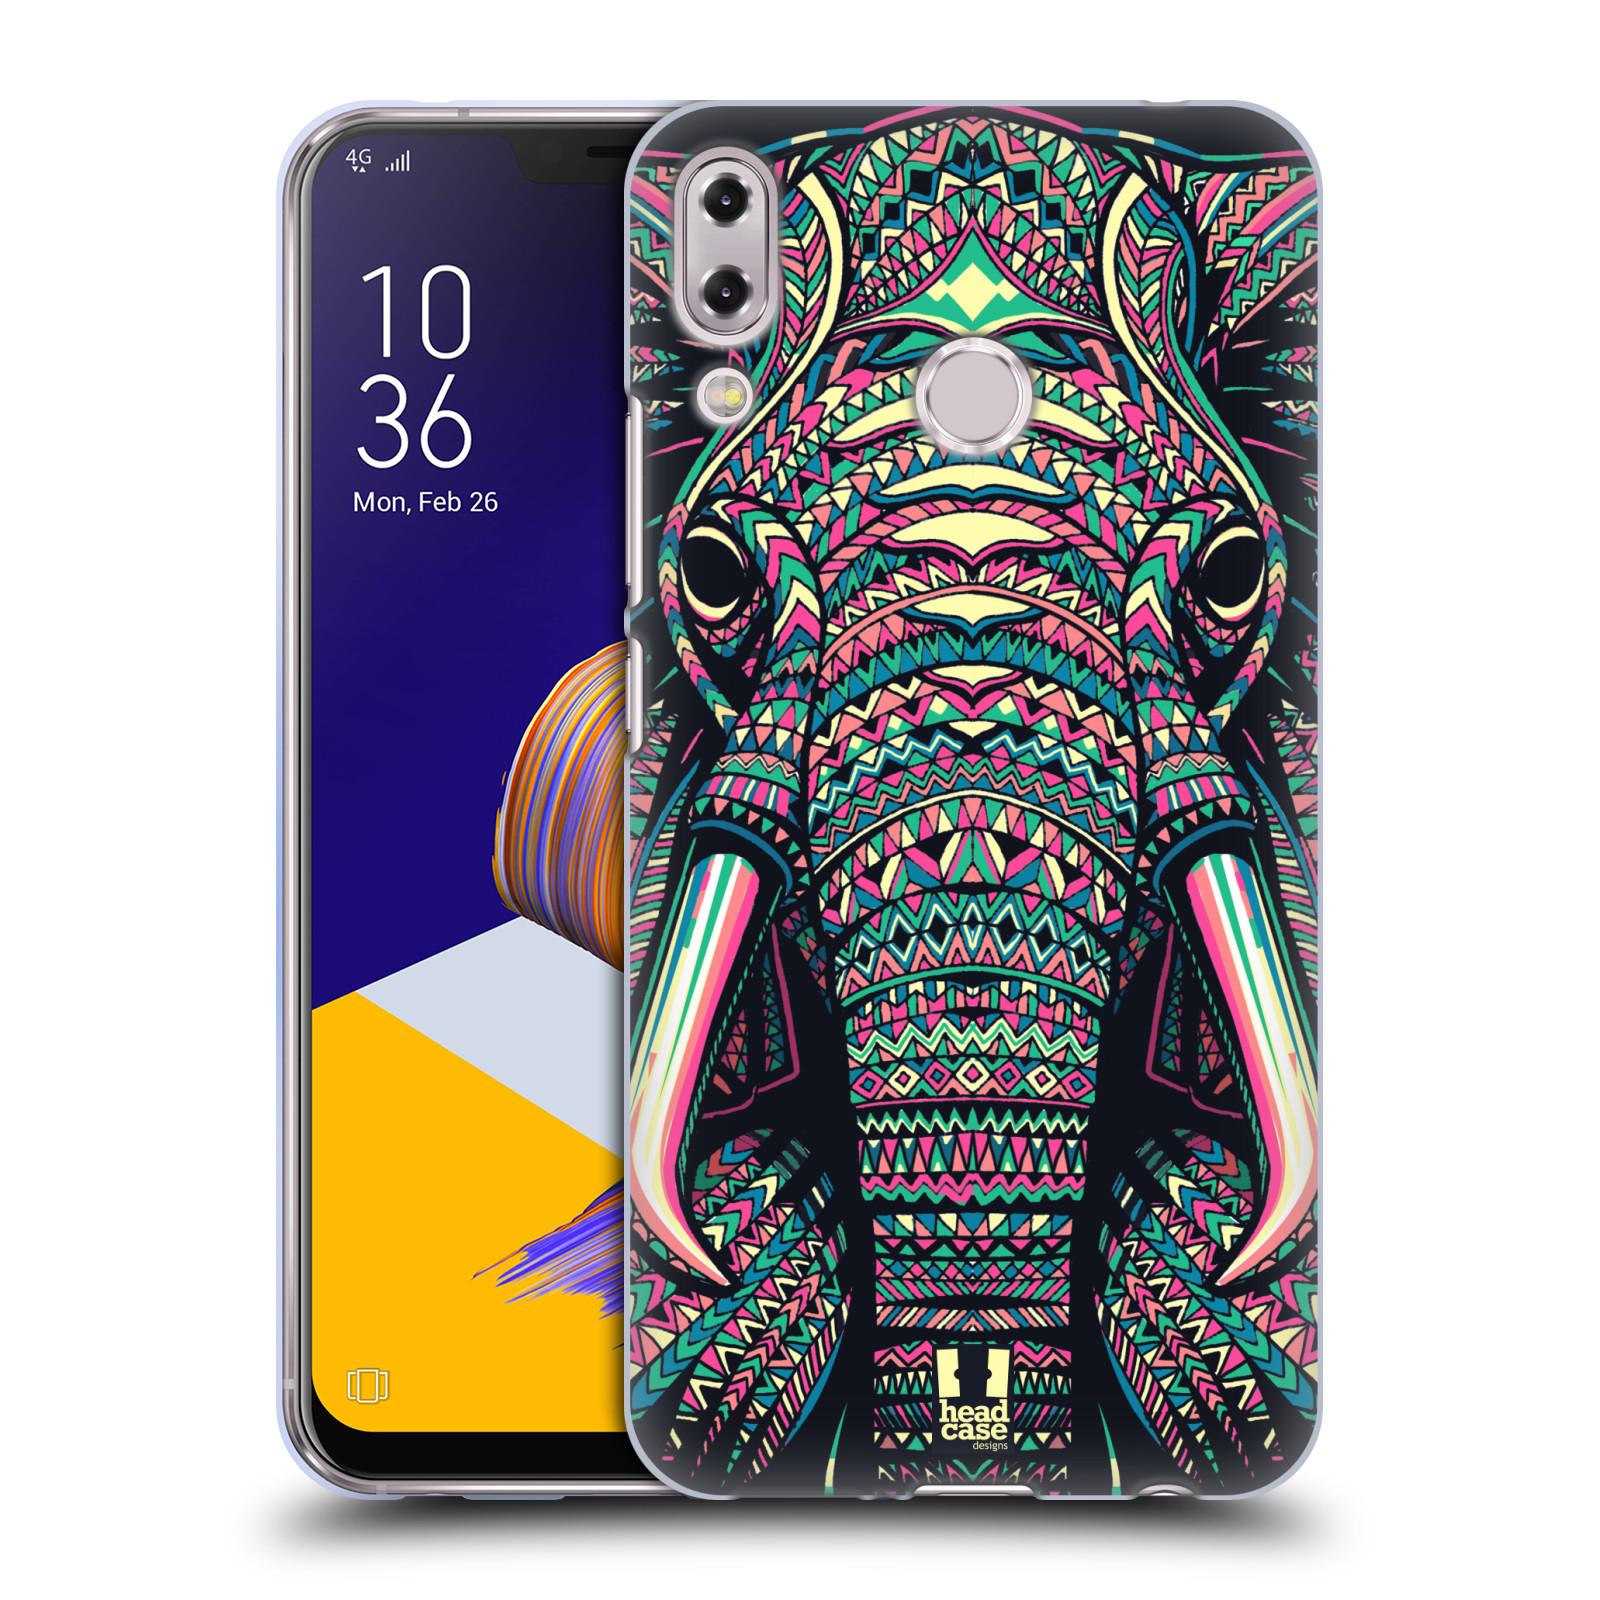 Silikonové pouzdro na mobil Asus Zenfone 5z ZS620KL - Head Case - AZTEC SLON